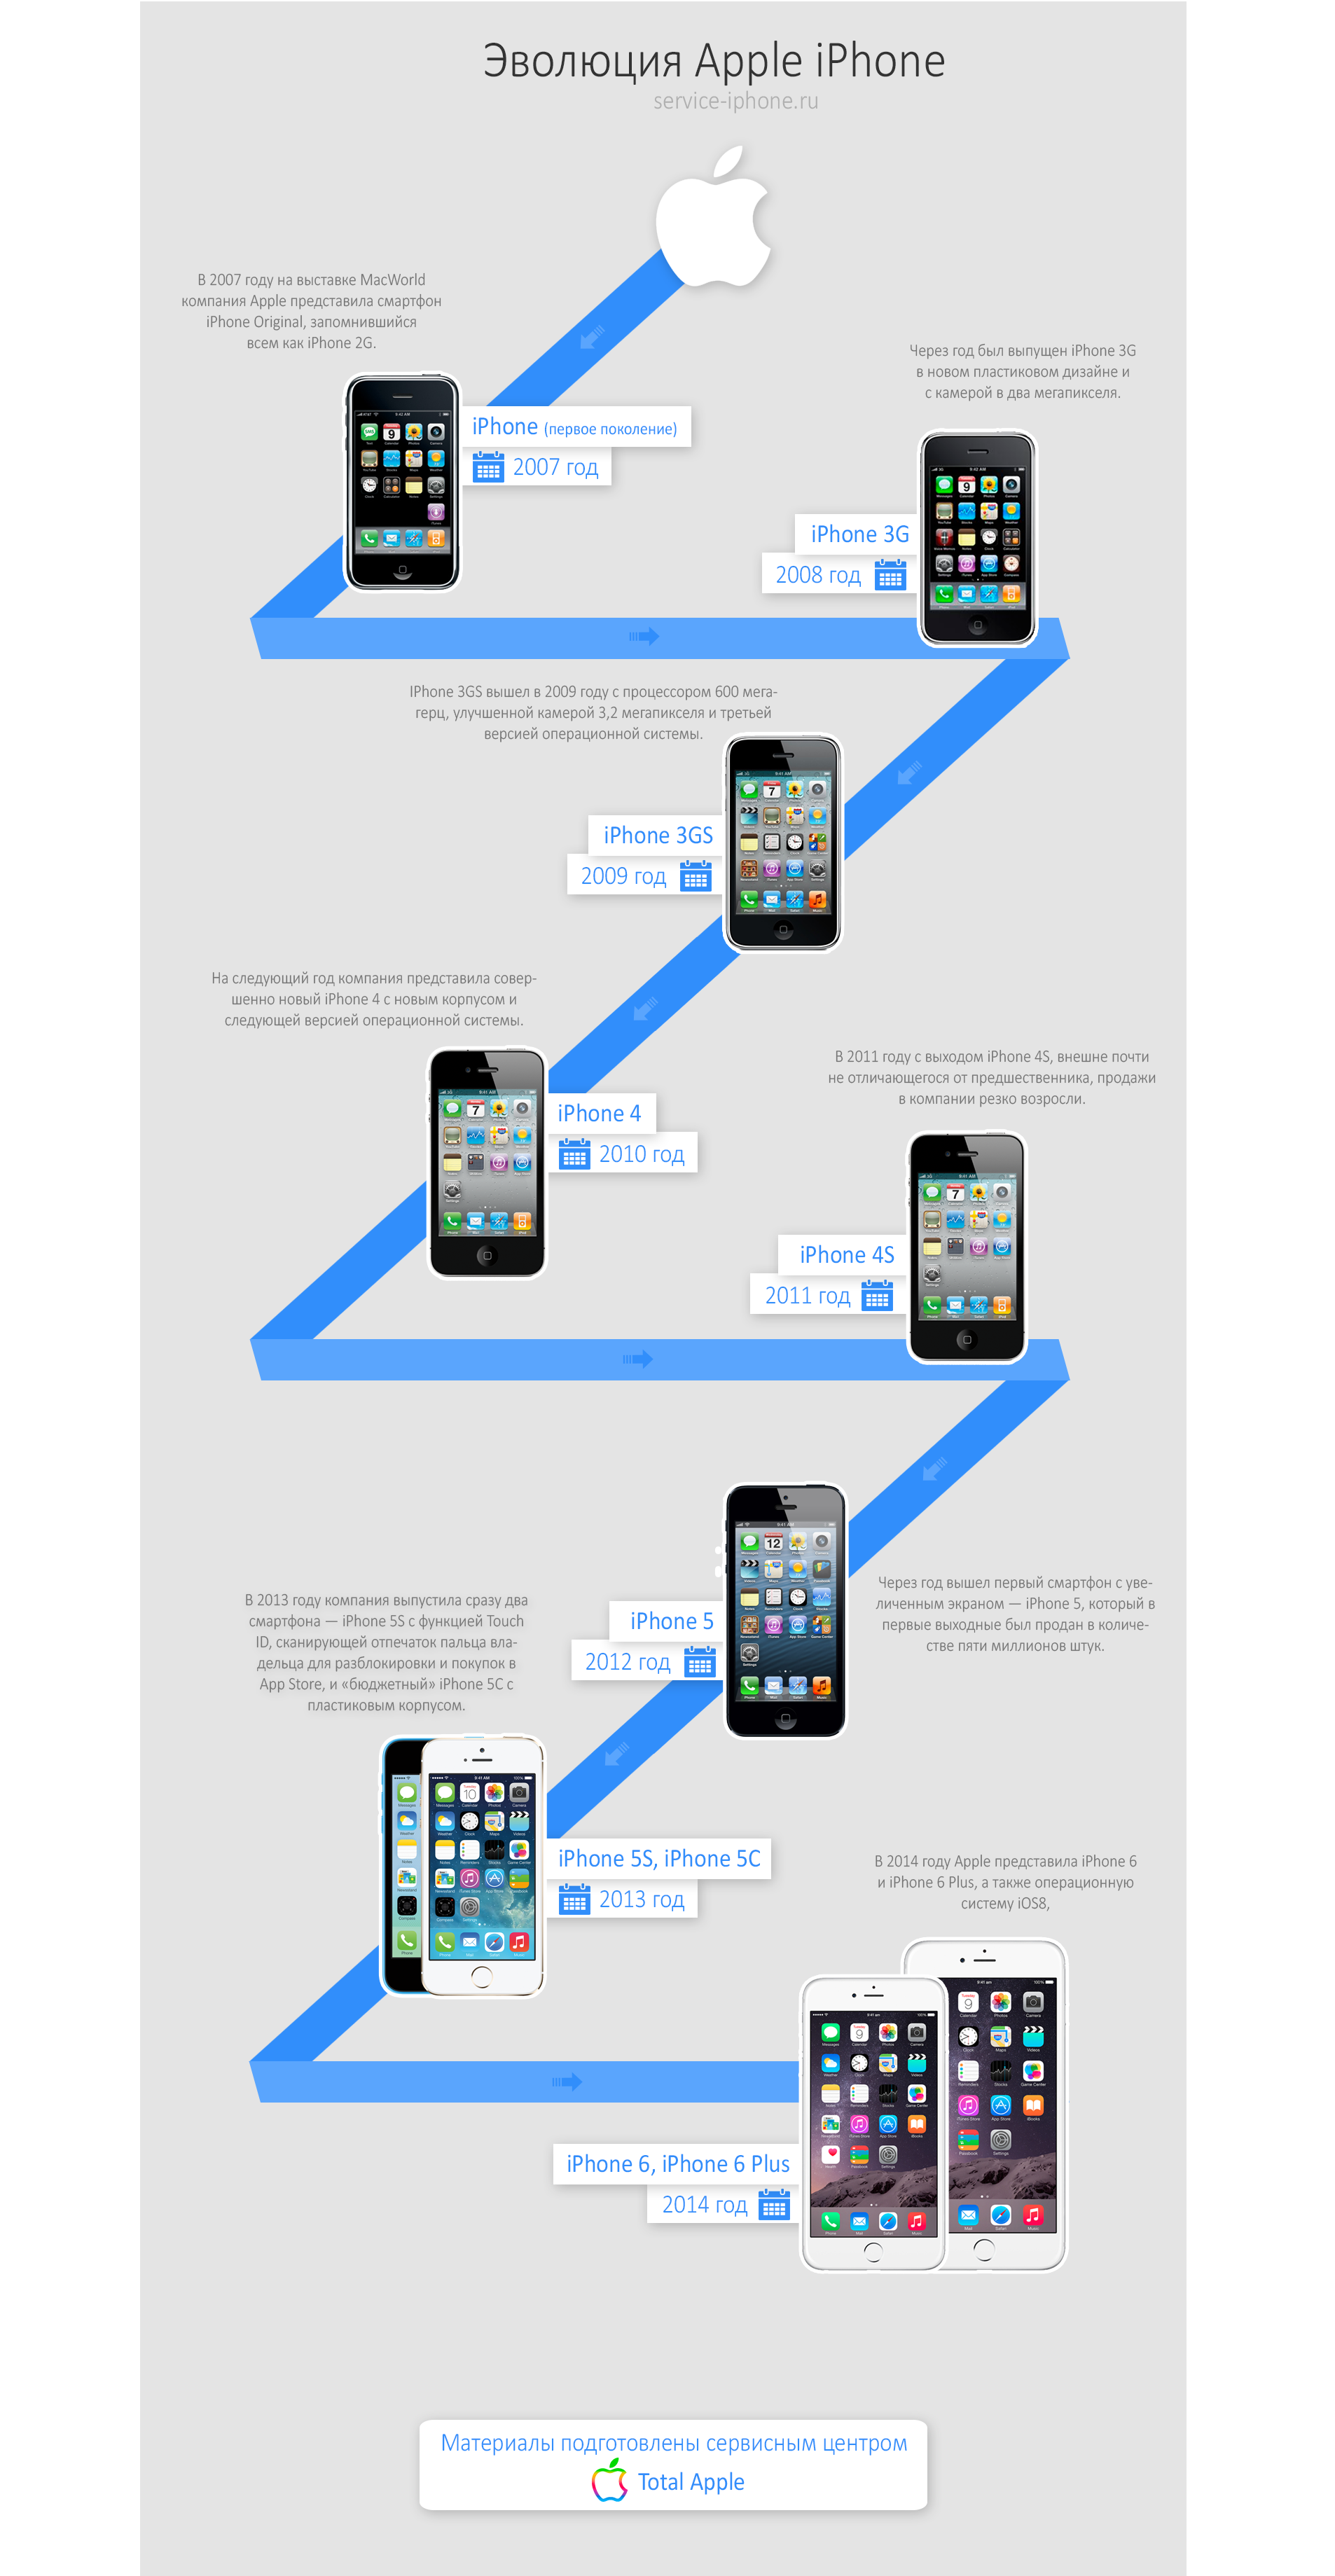 Эволюция Apple iPhone - фото 1 | Сервисный центр Total Apple